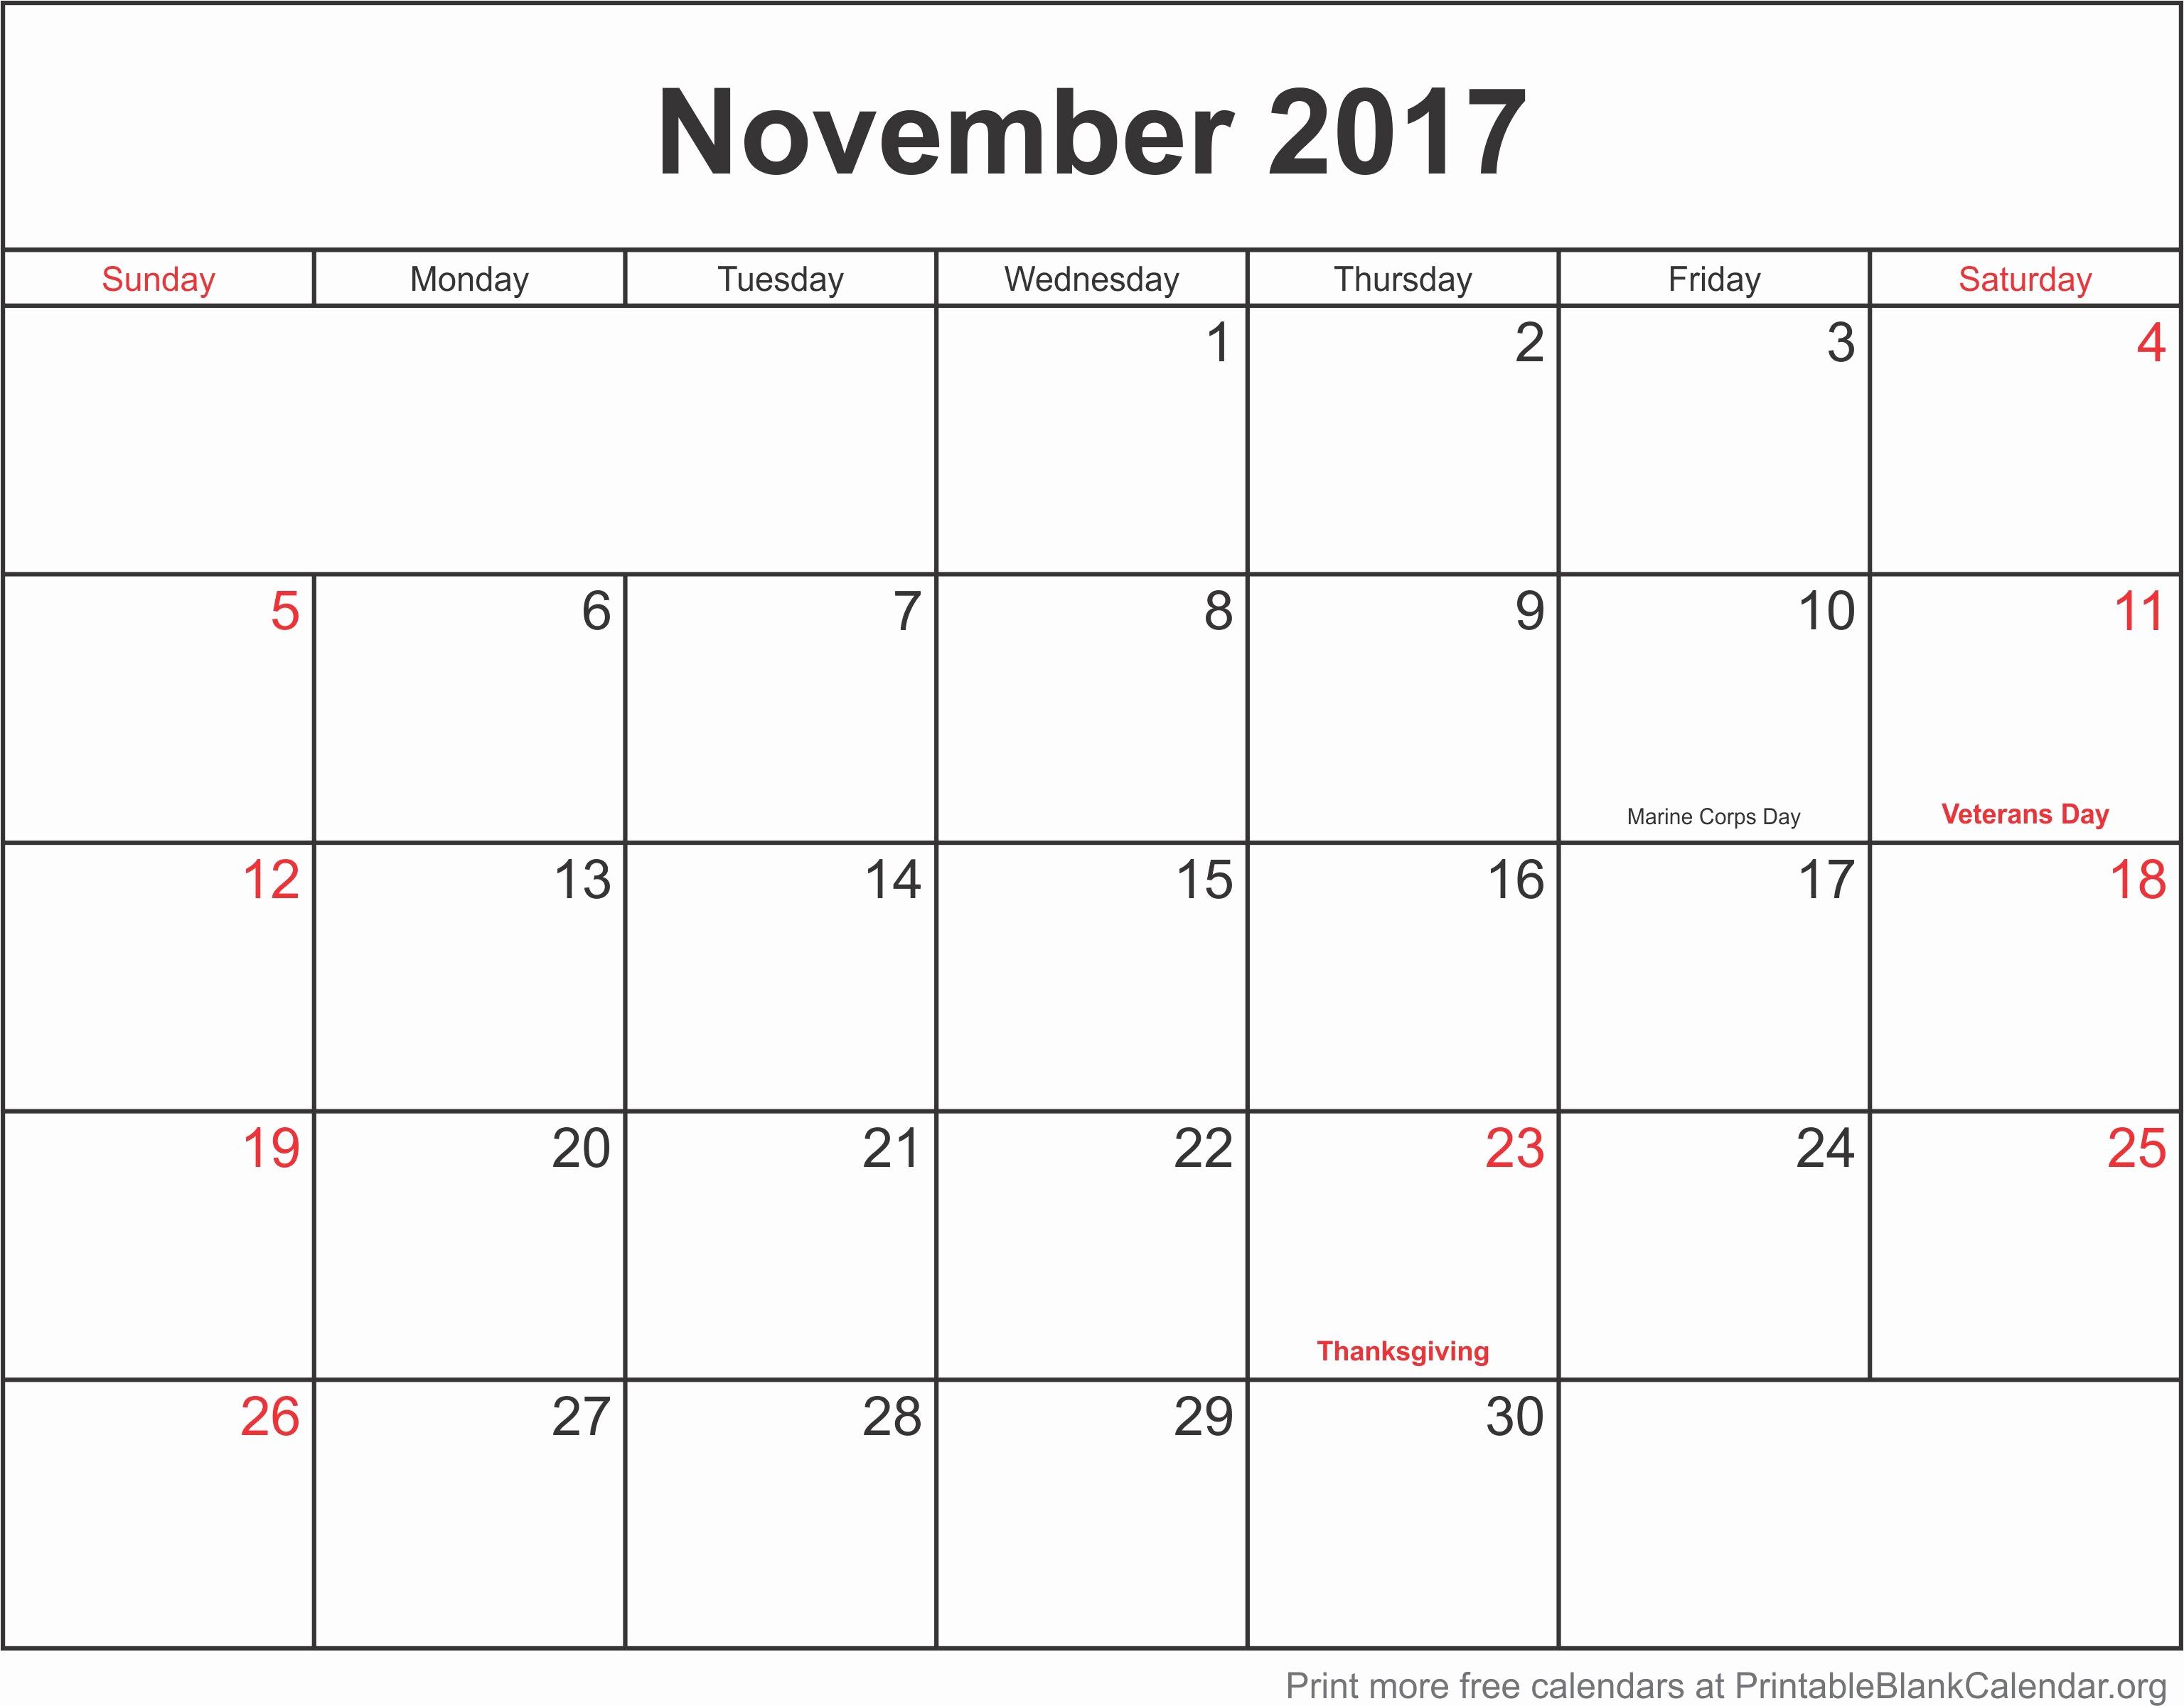 Blank November 2017 Calendar Template Best Of November 2017 Monthly Calendar Printable Blank Calendar